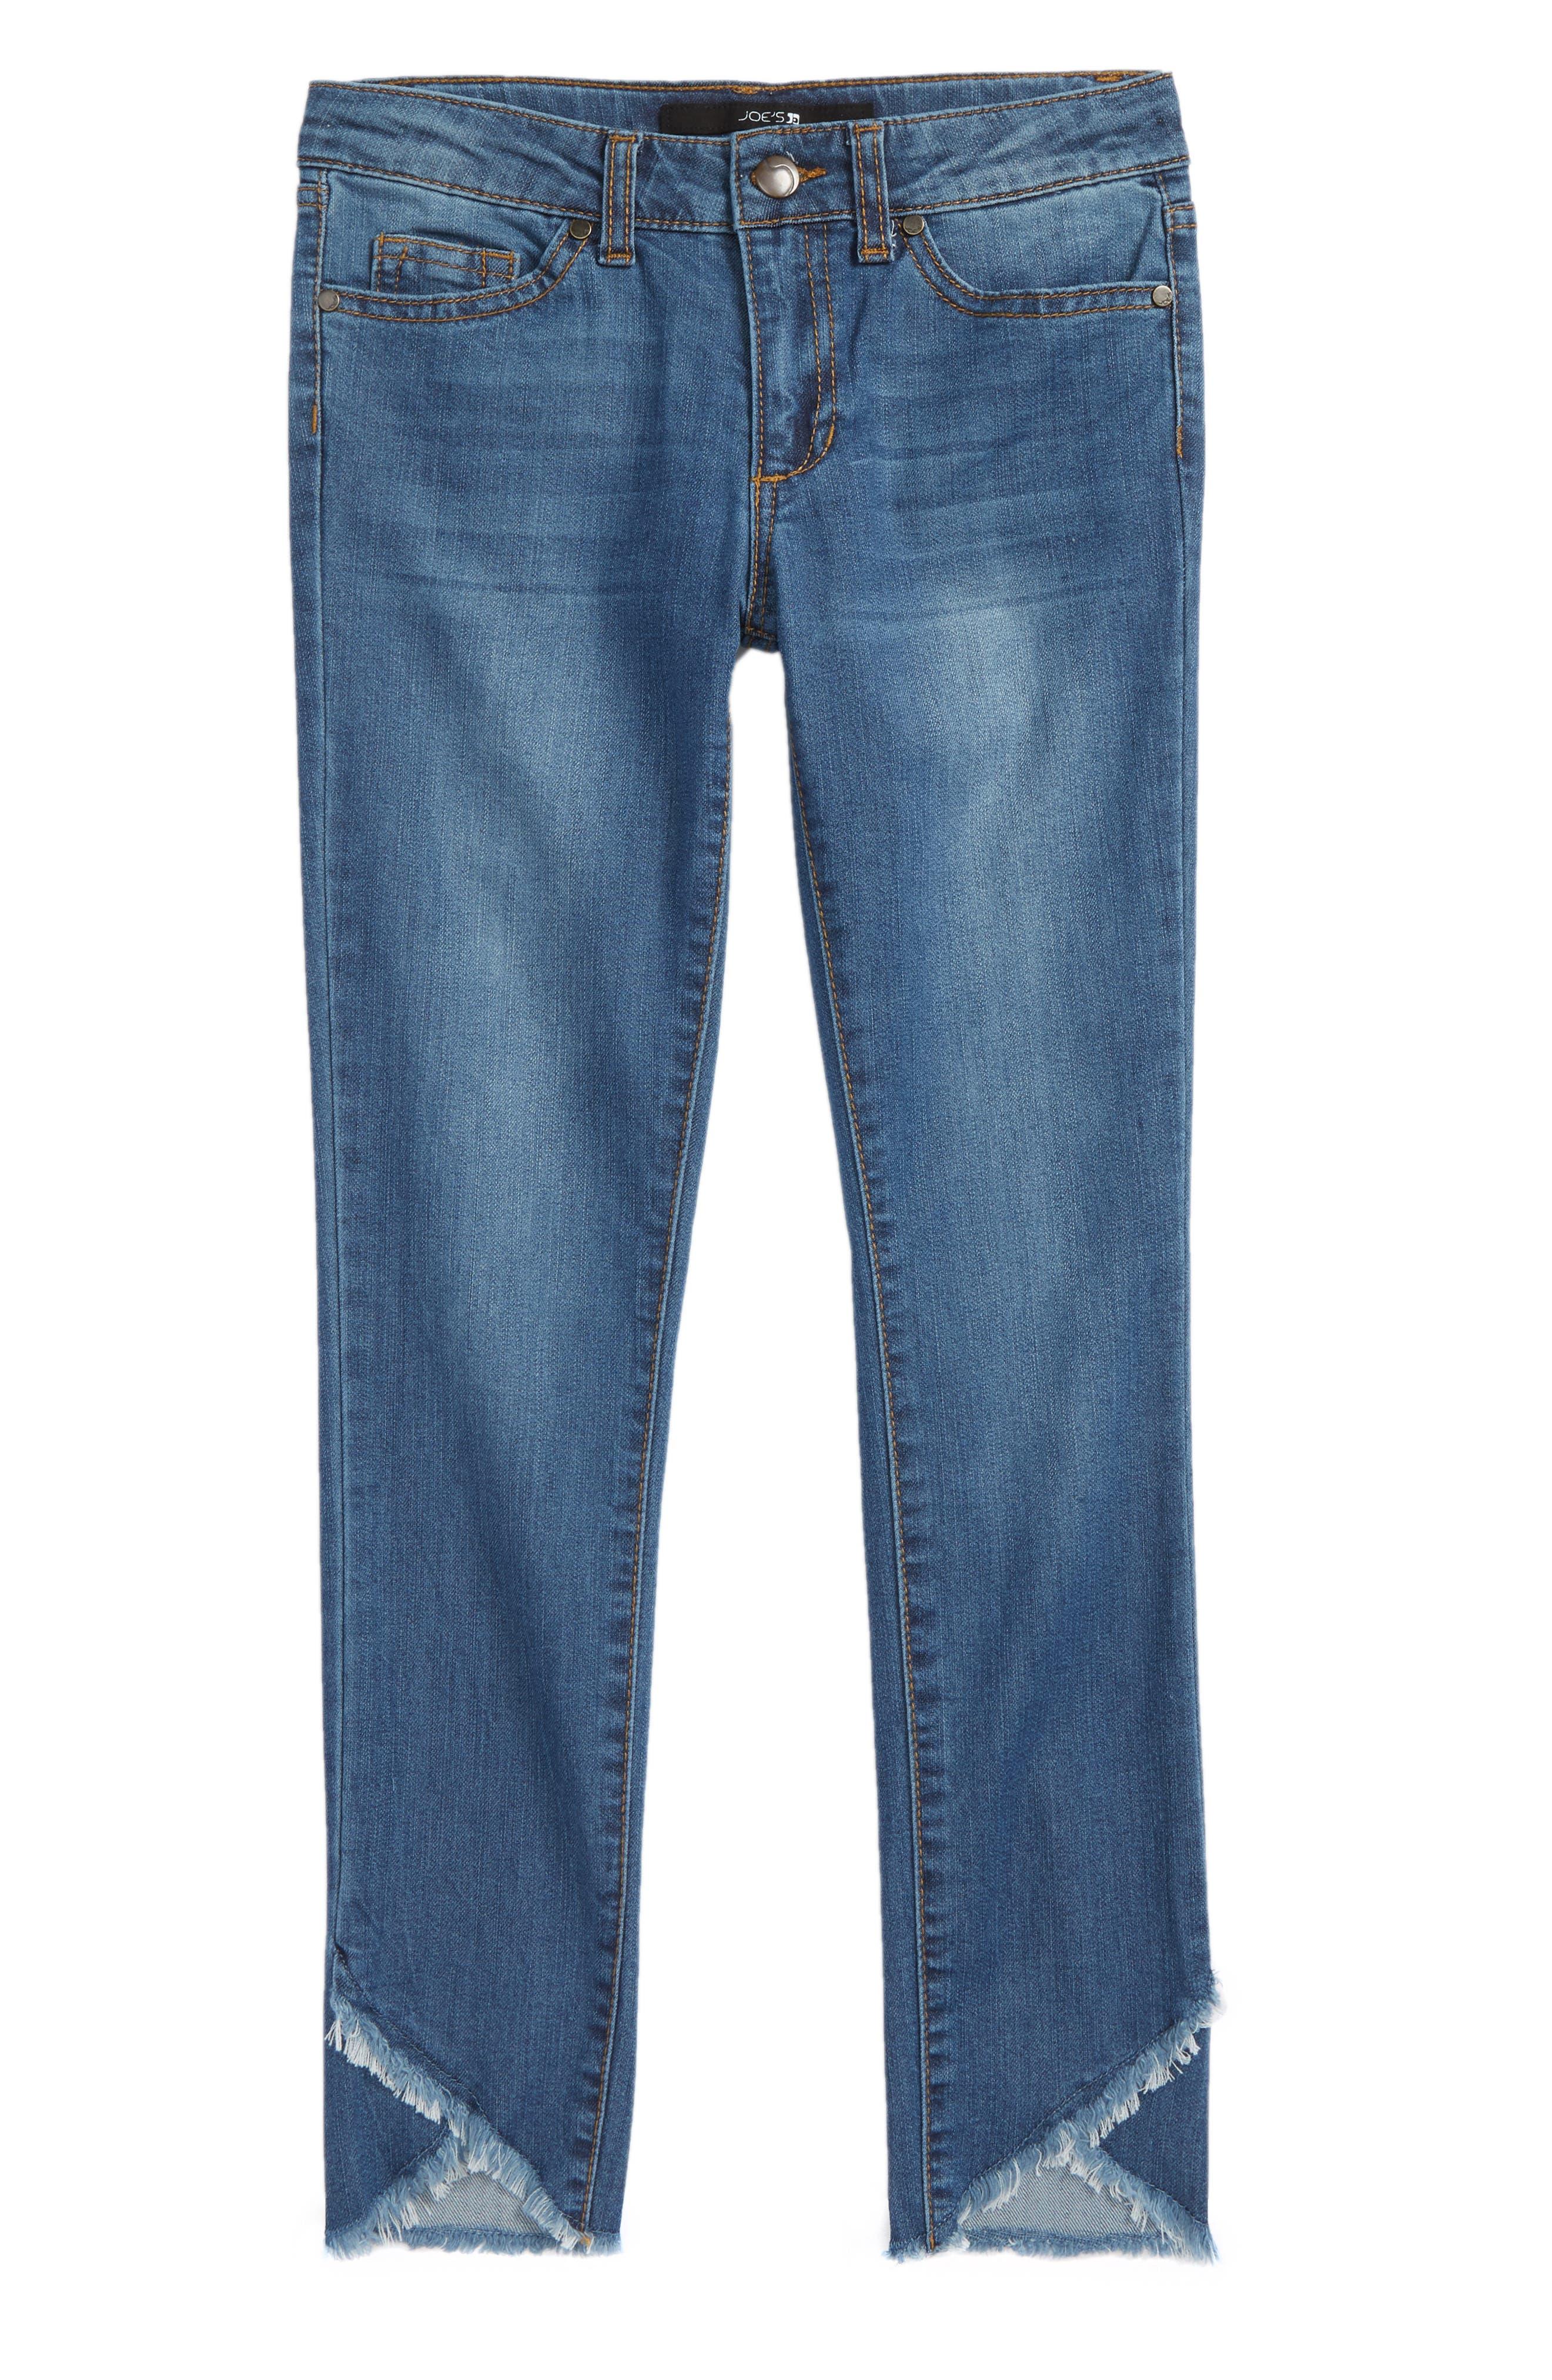 JOE'S The Markie Ankle Tulip Hem Skinny Jeans, Main, color, 499